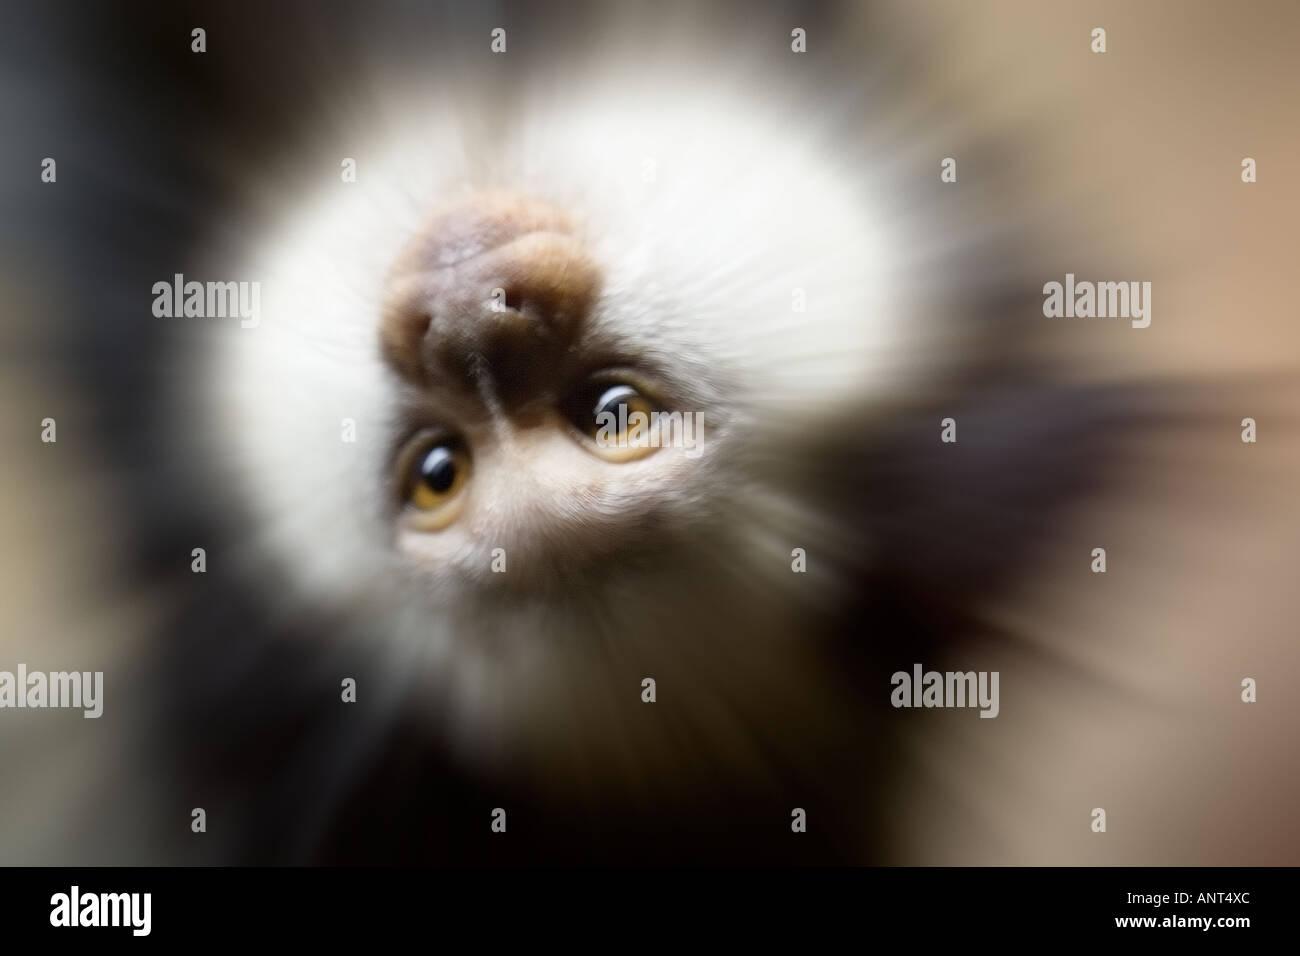 zoom on monkey - Stock Image